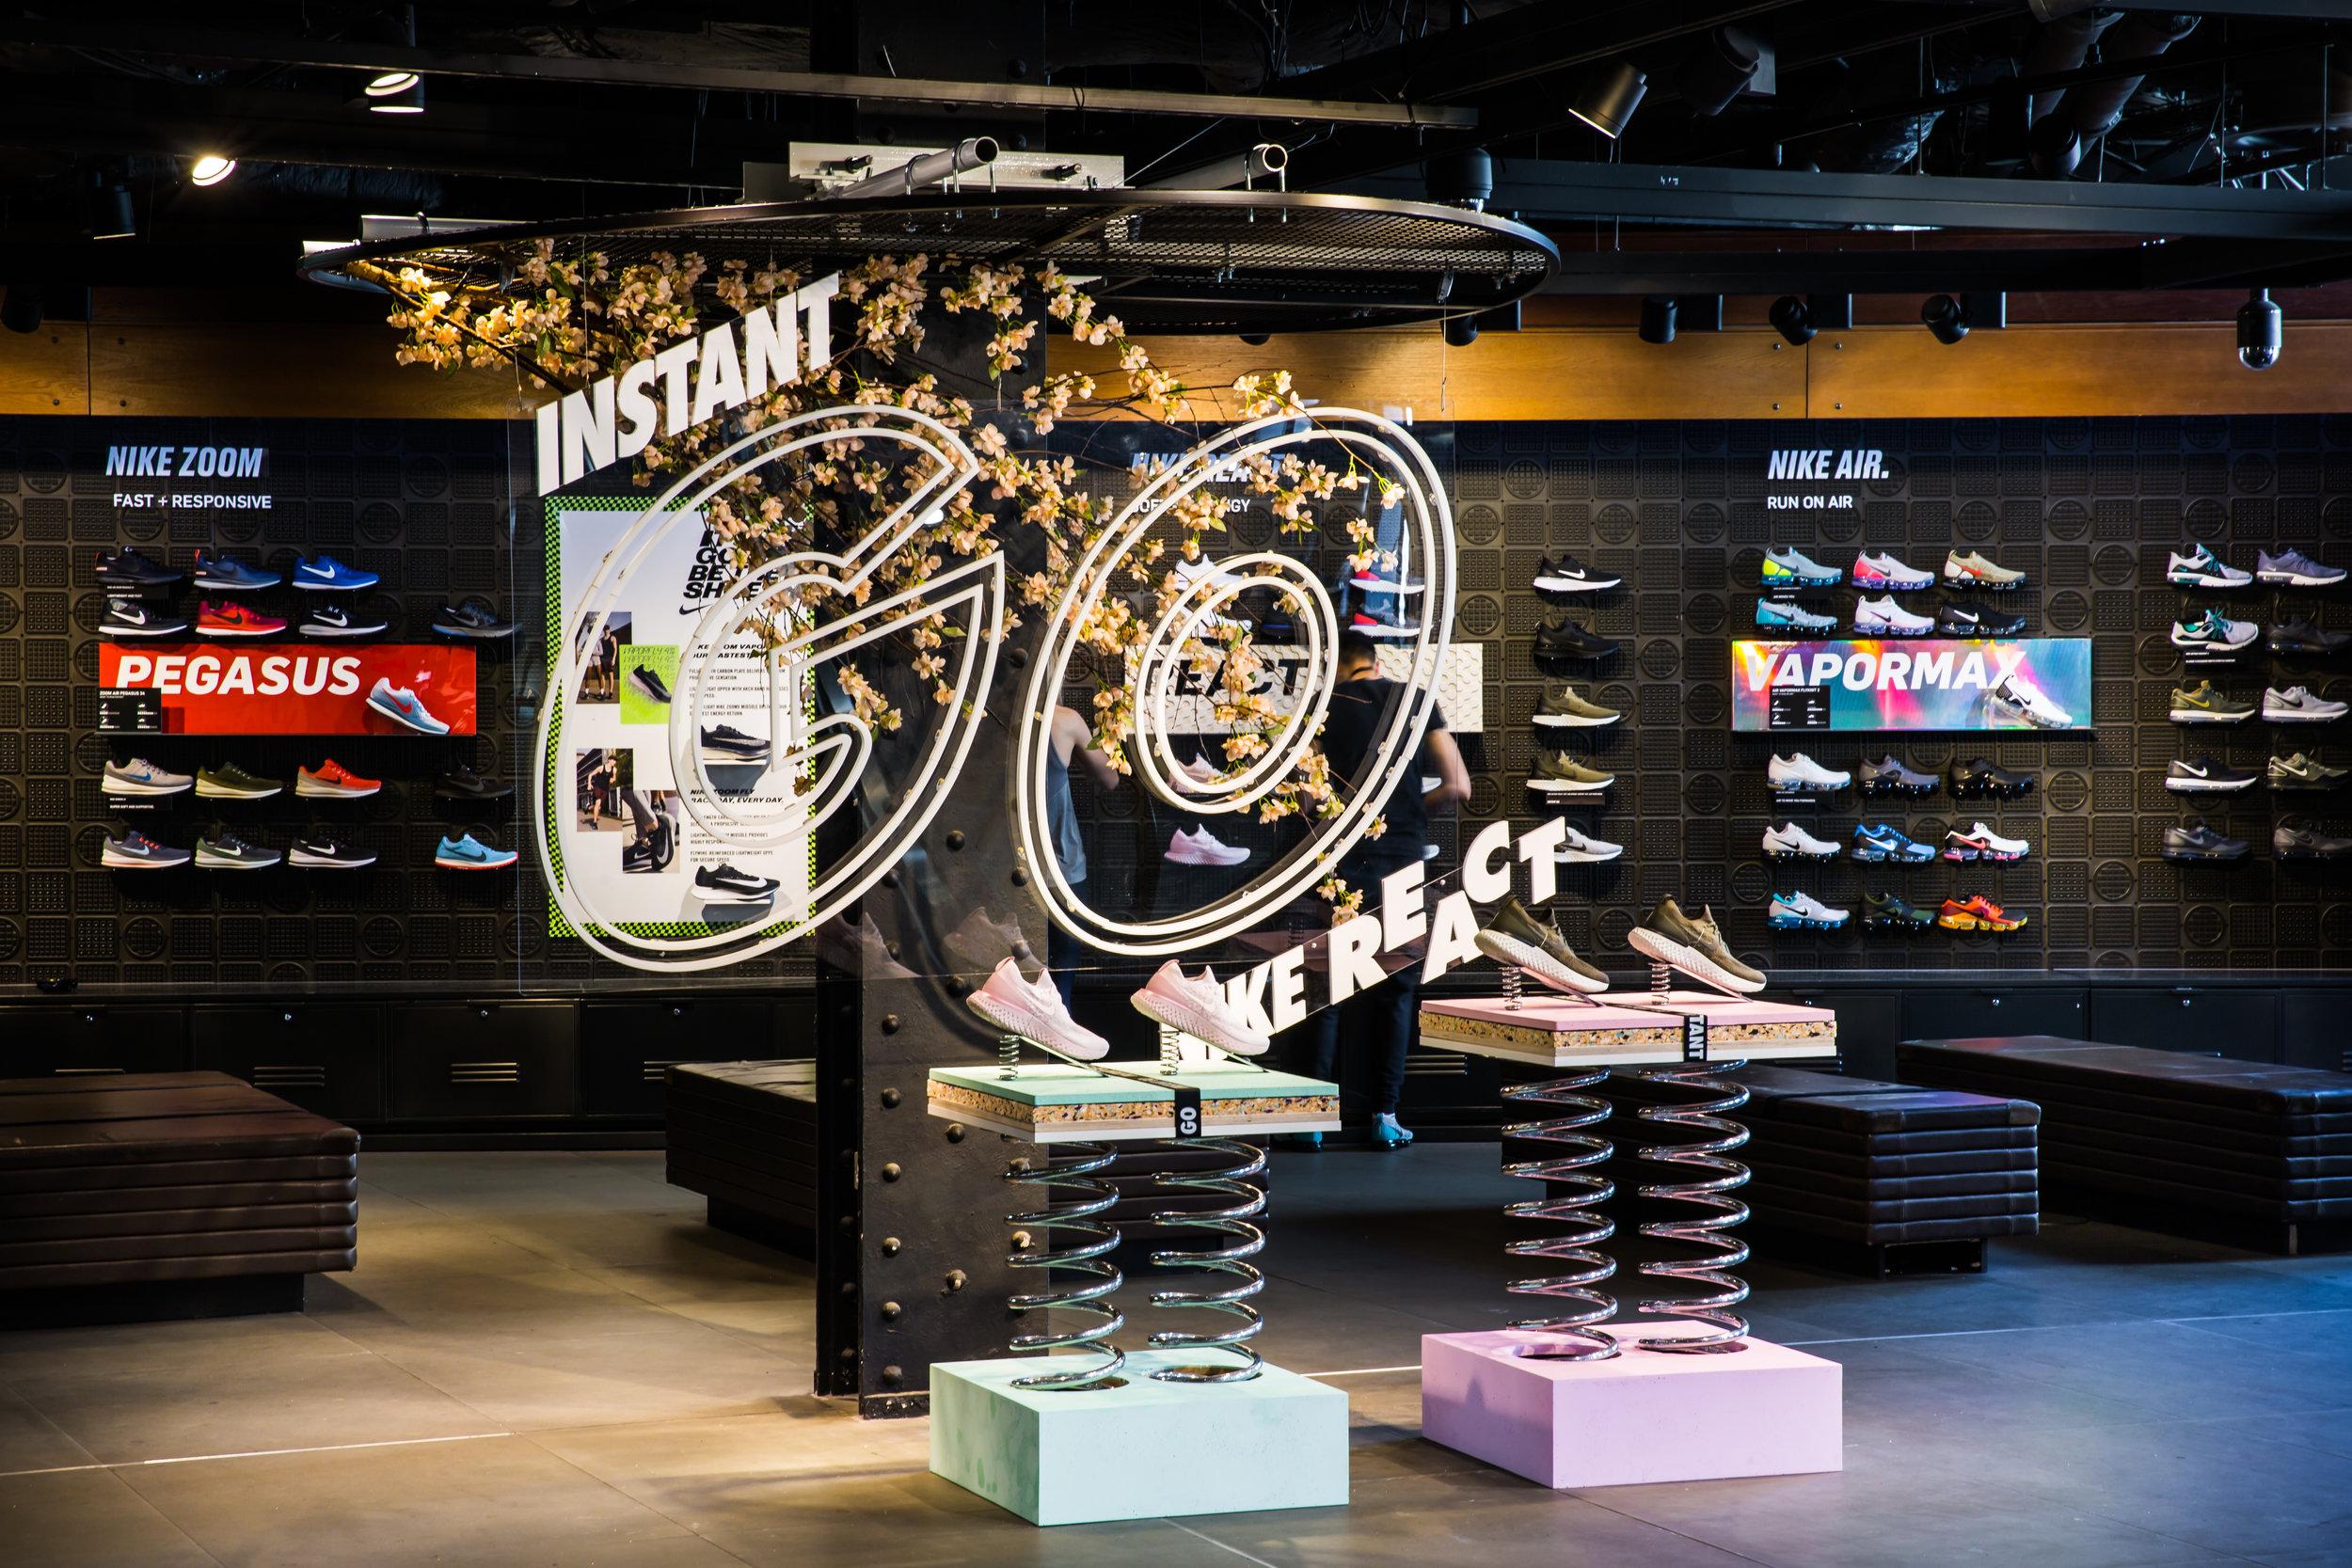 TDM_0781 - Nike - React Pro - NTL - MA Licensing - Tom D Morgan - HIGH RES.jpg